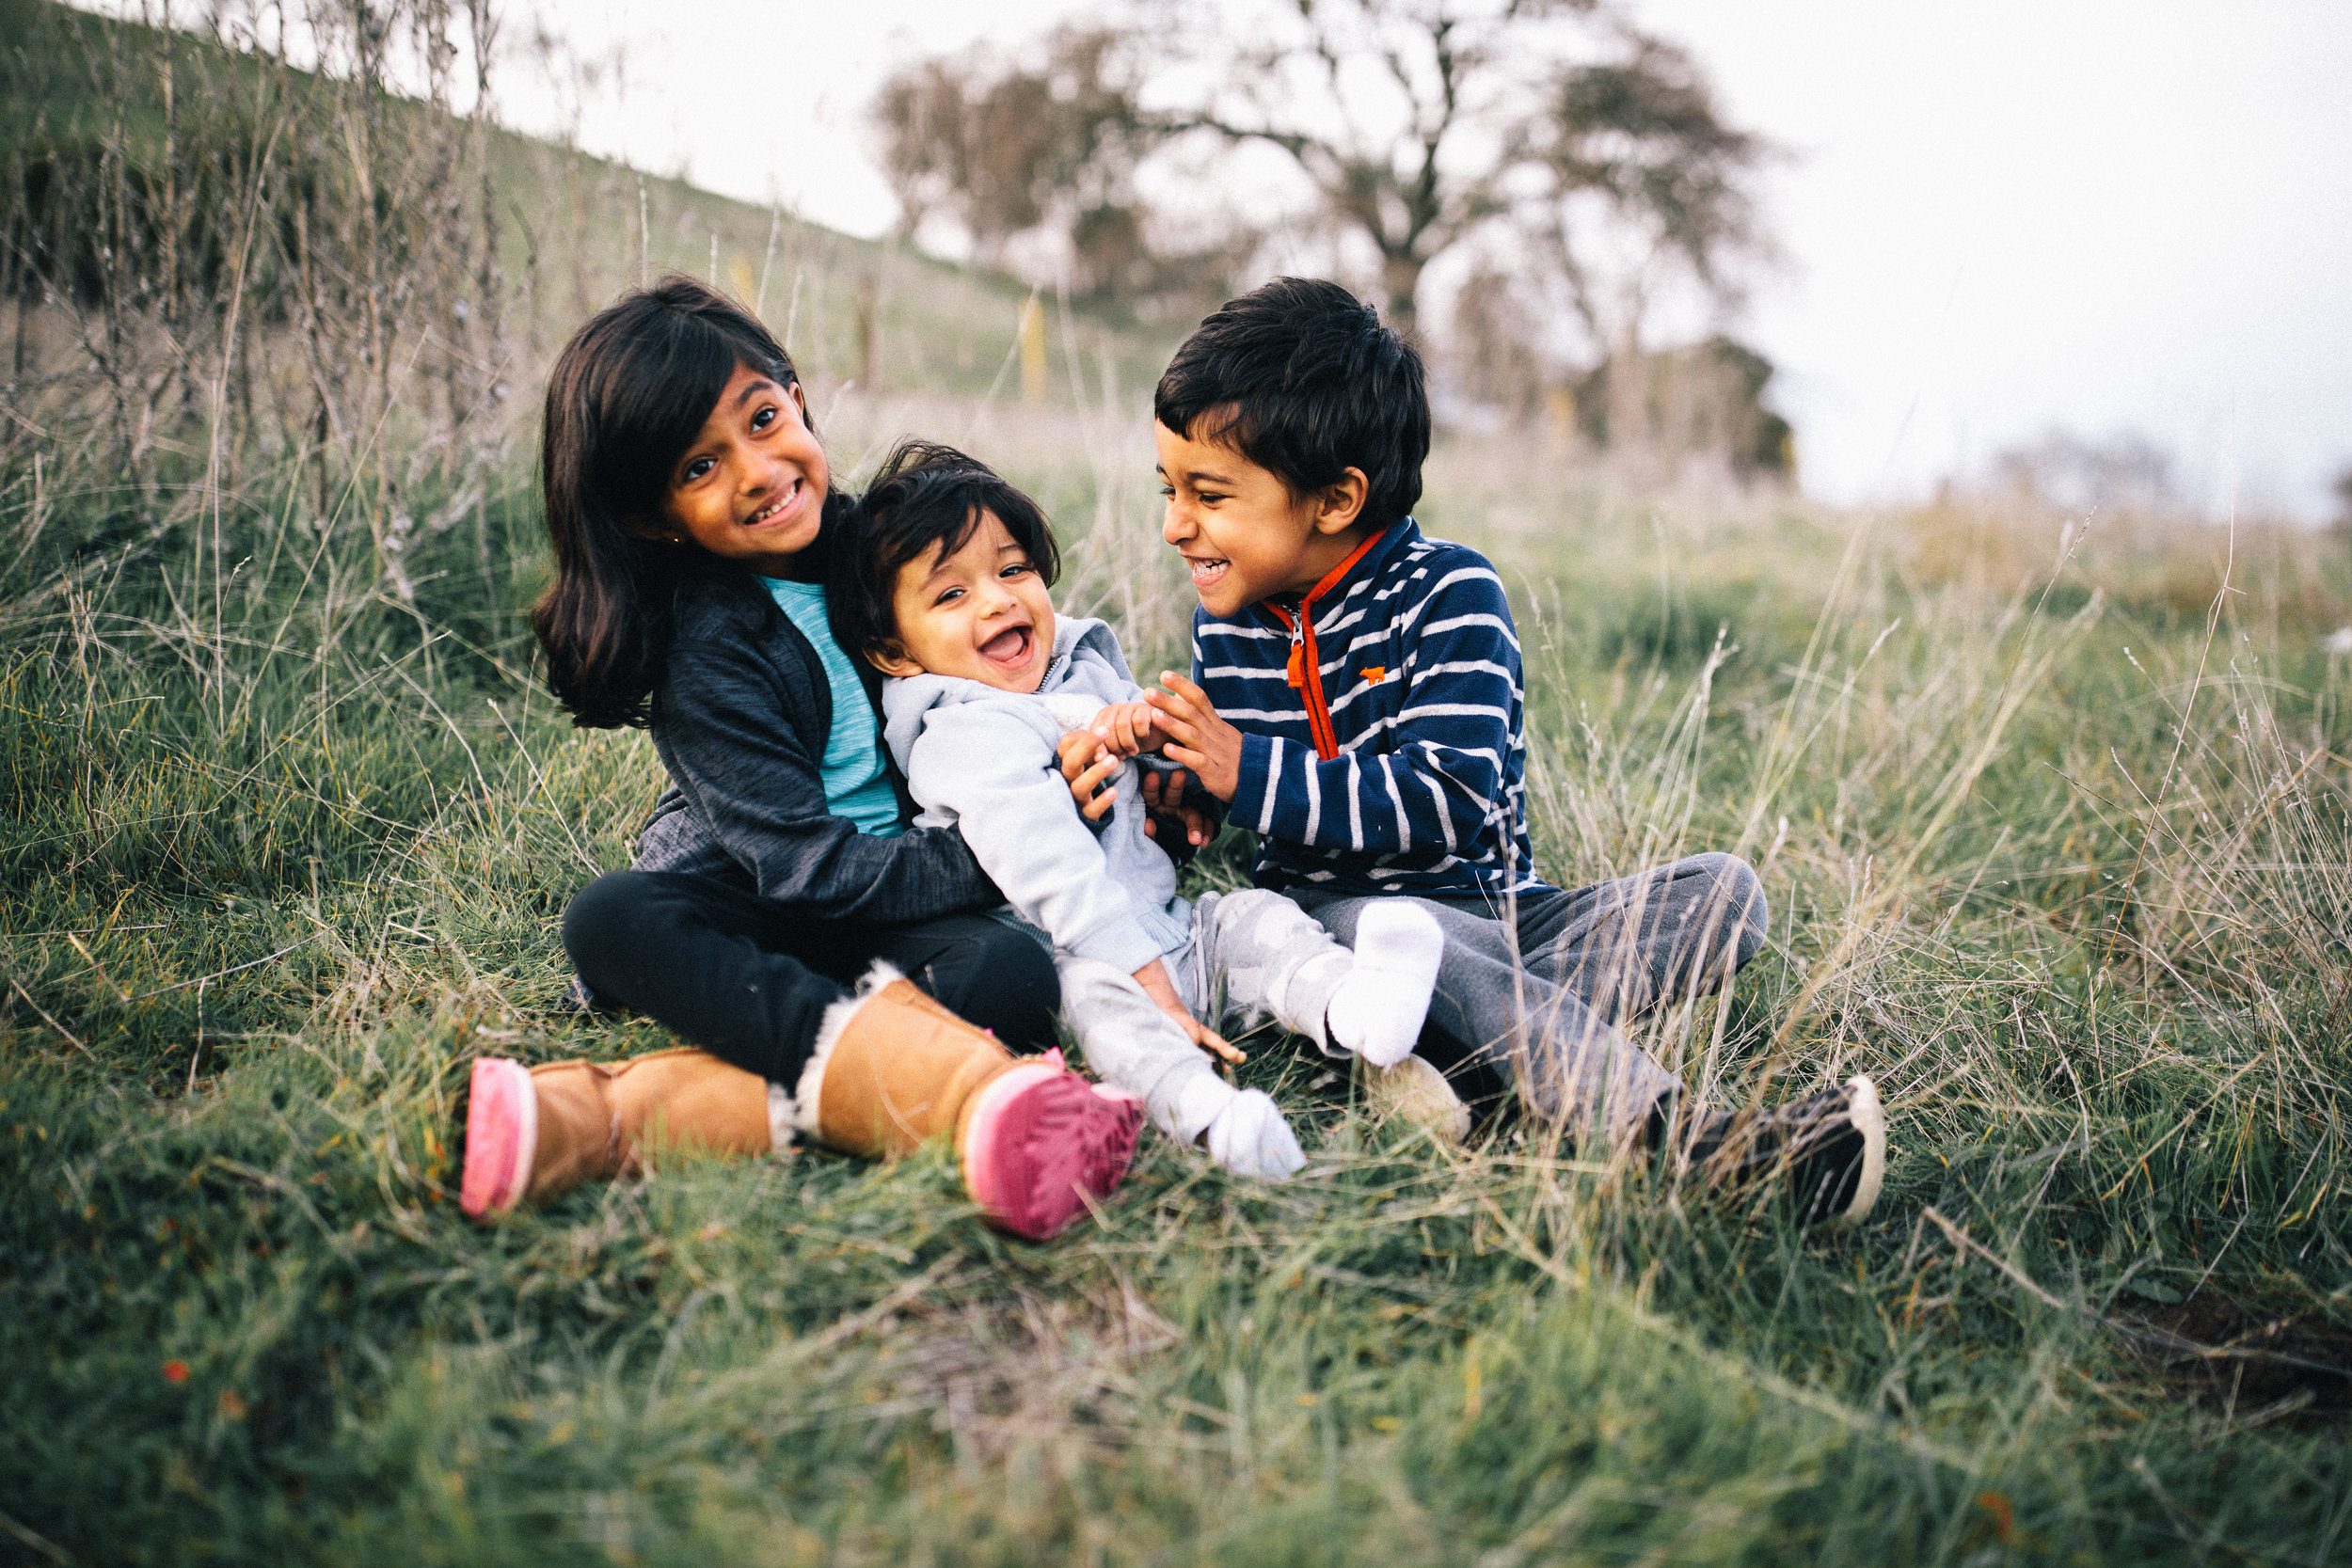 2018_01_01 Ahmad Family Session Blog Photos Edited Full Resolution 0030.jpg